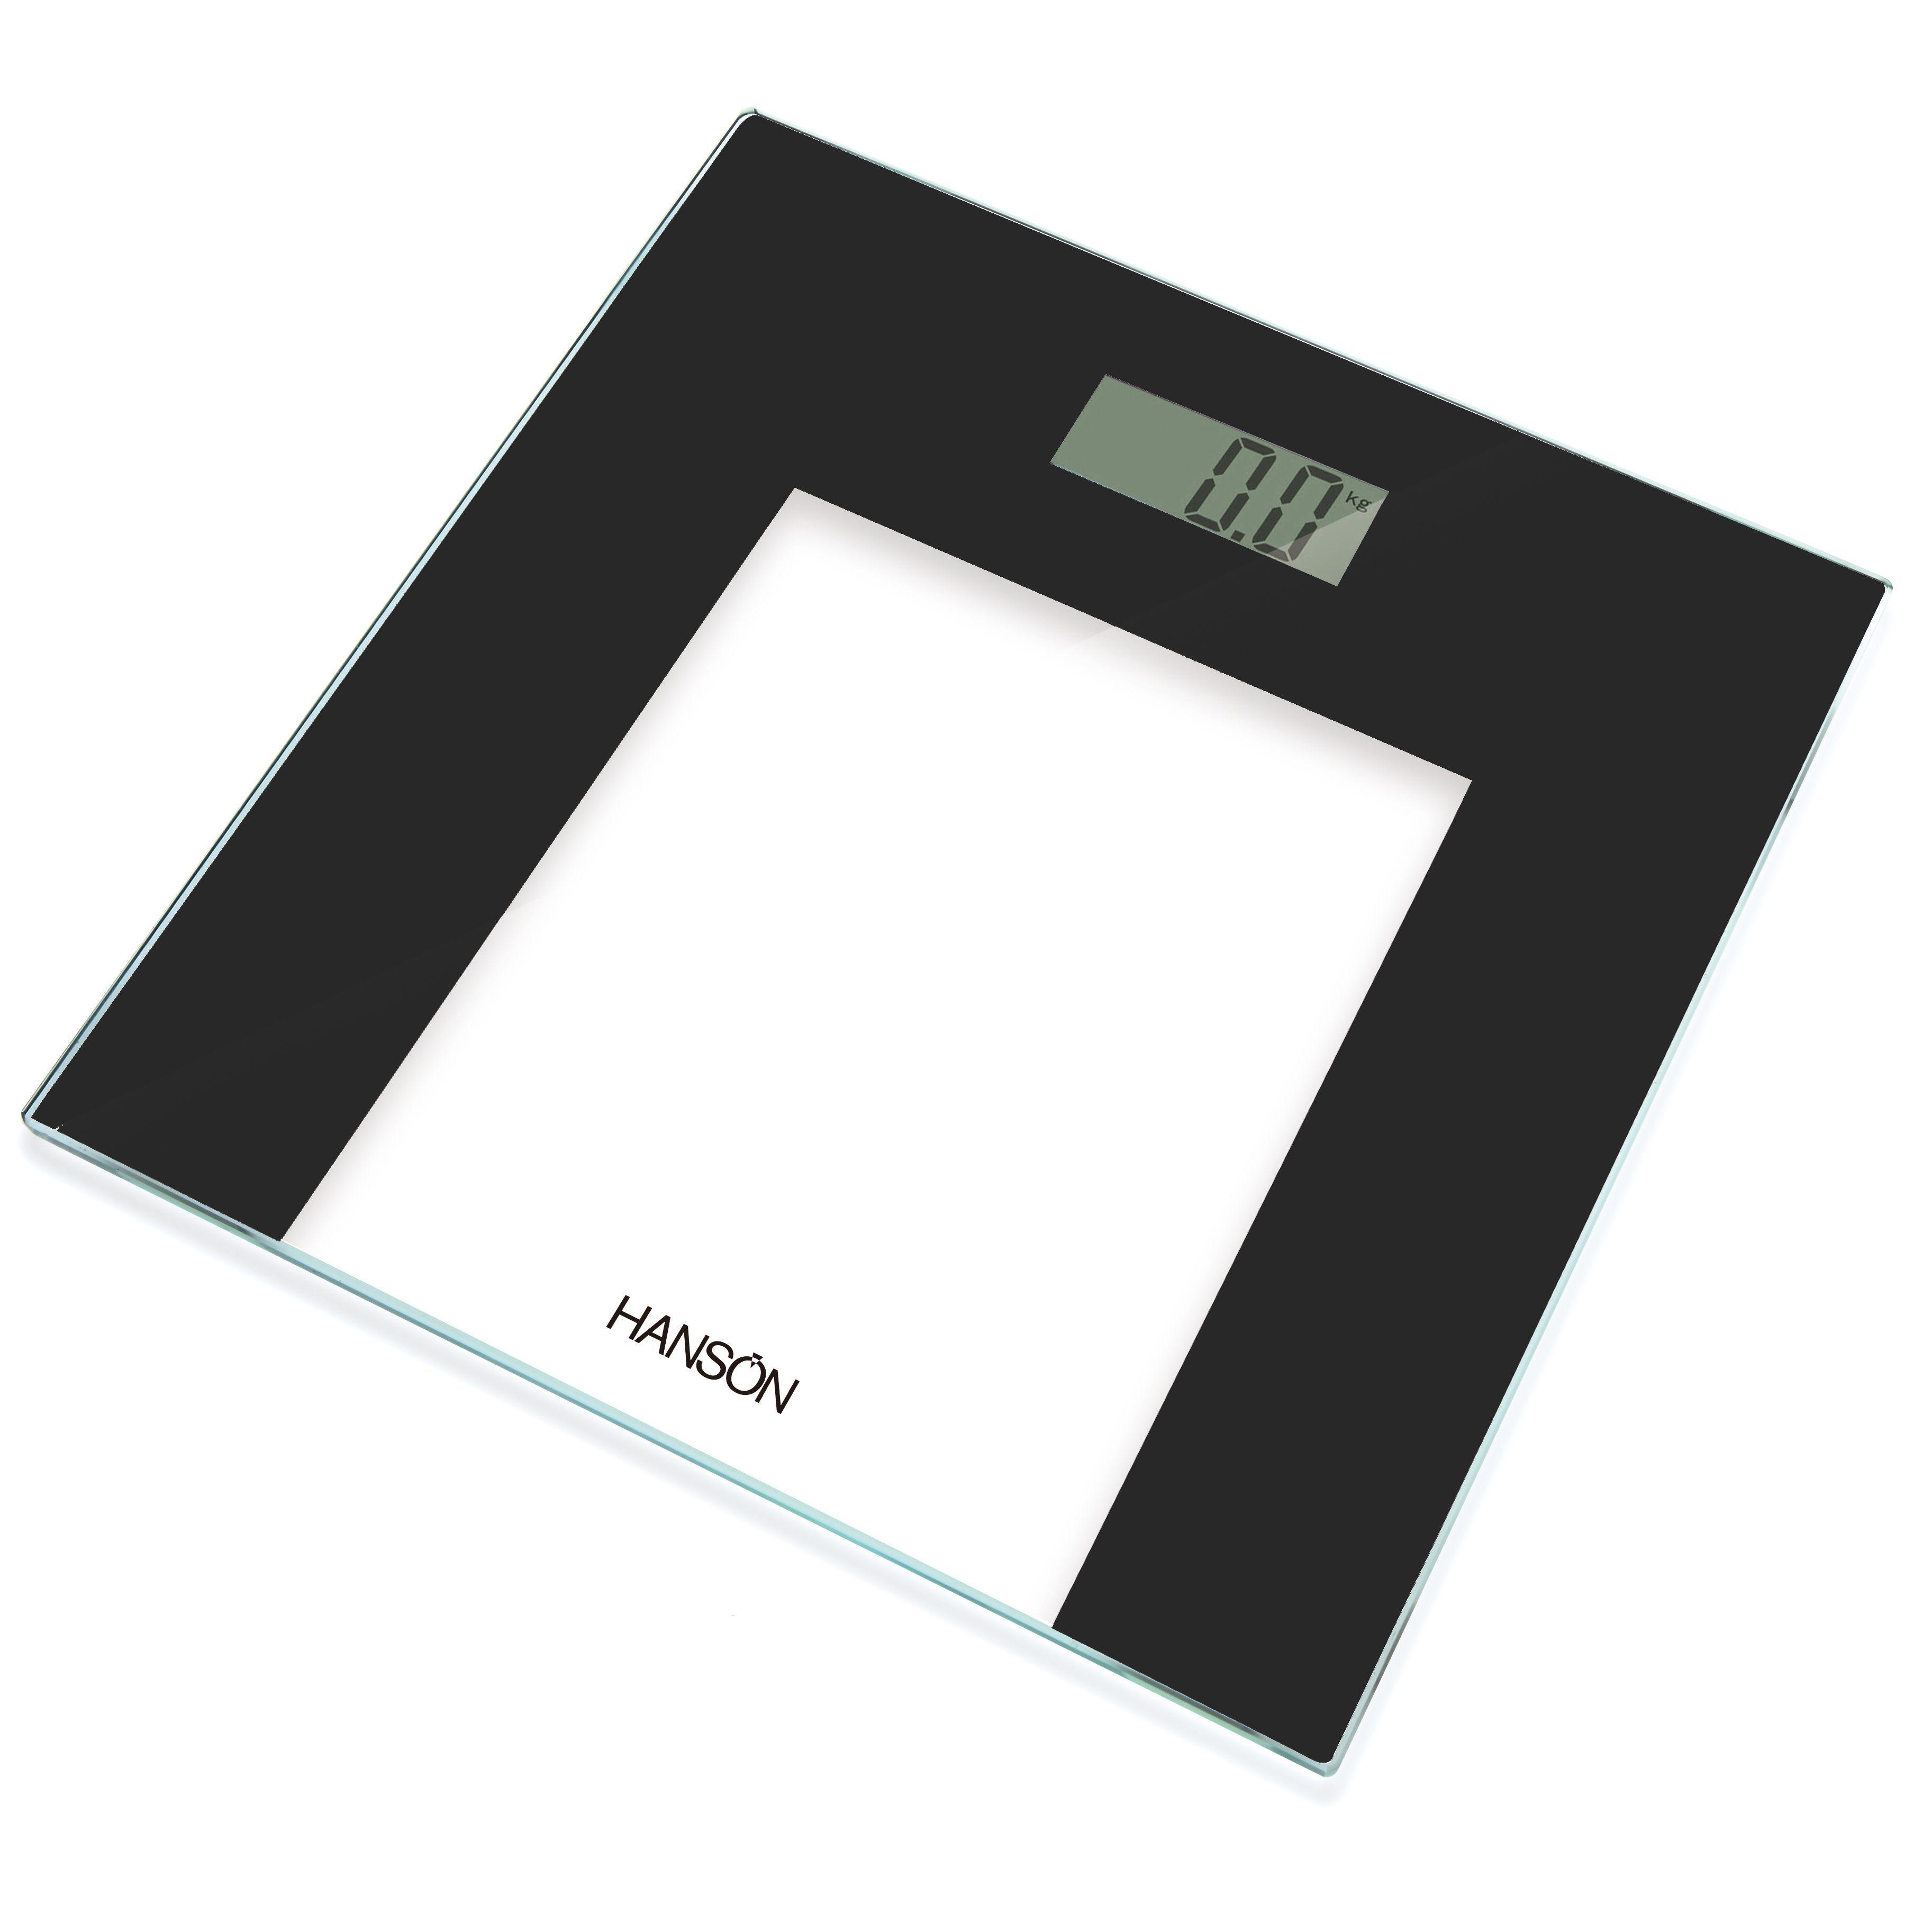 Hanson Black Slim Bathroom Scale